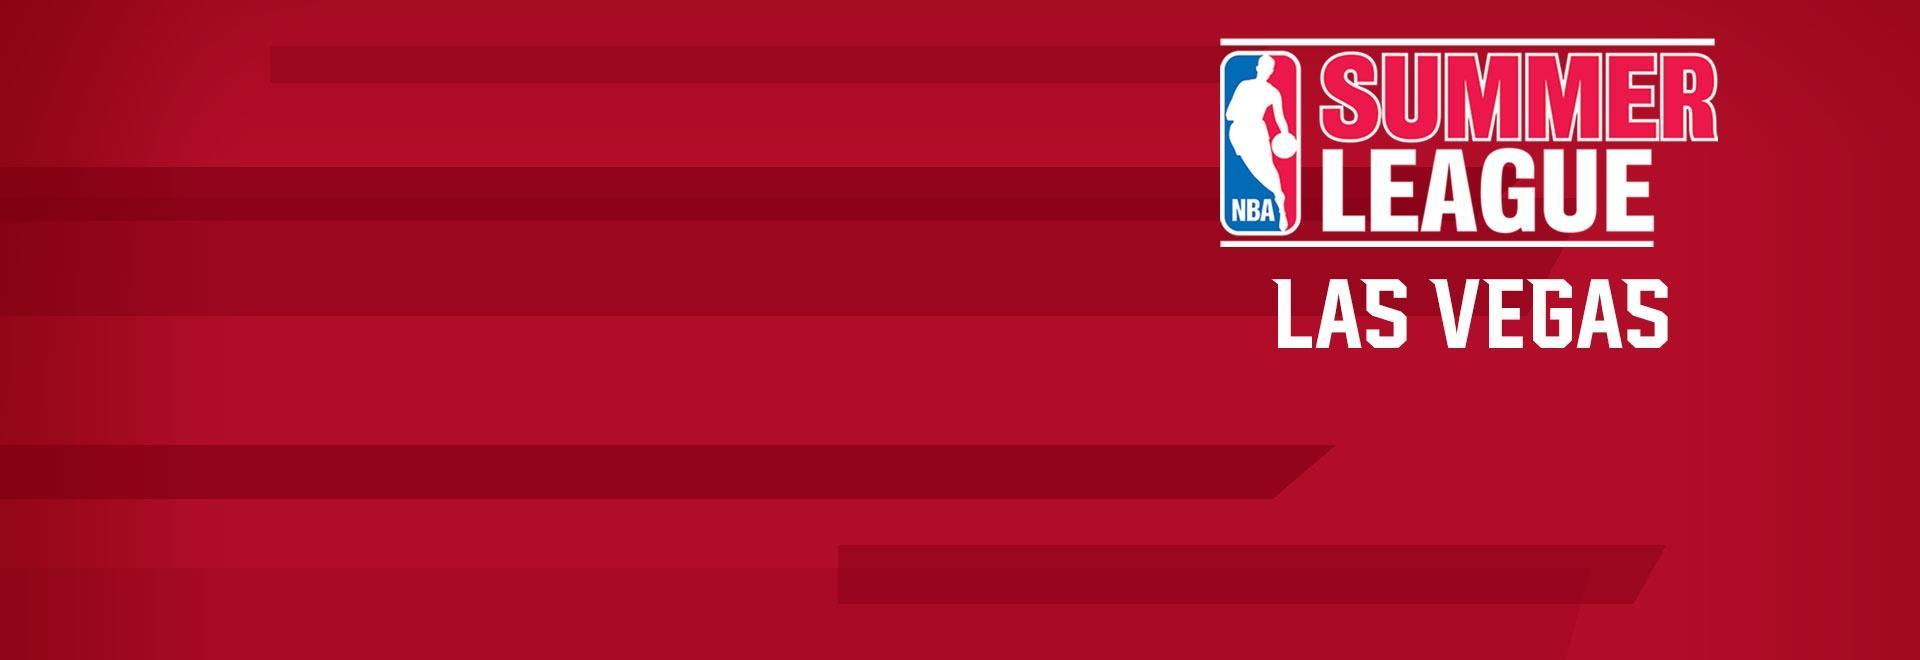 NBA Summer League Vegas